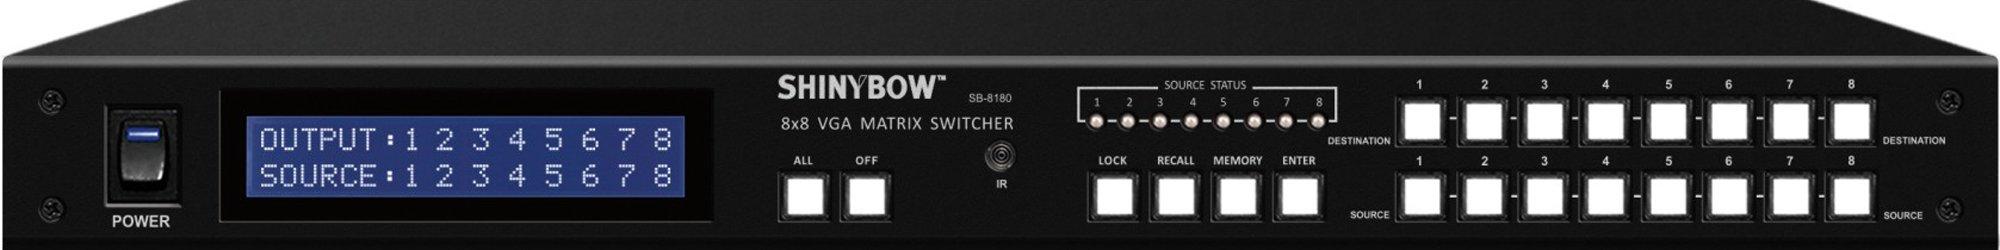 8x8 (8:8) VGA PC RGBHV Video Matrix Switch Switcher + RS232+ IR Remote SB-8180